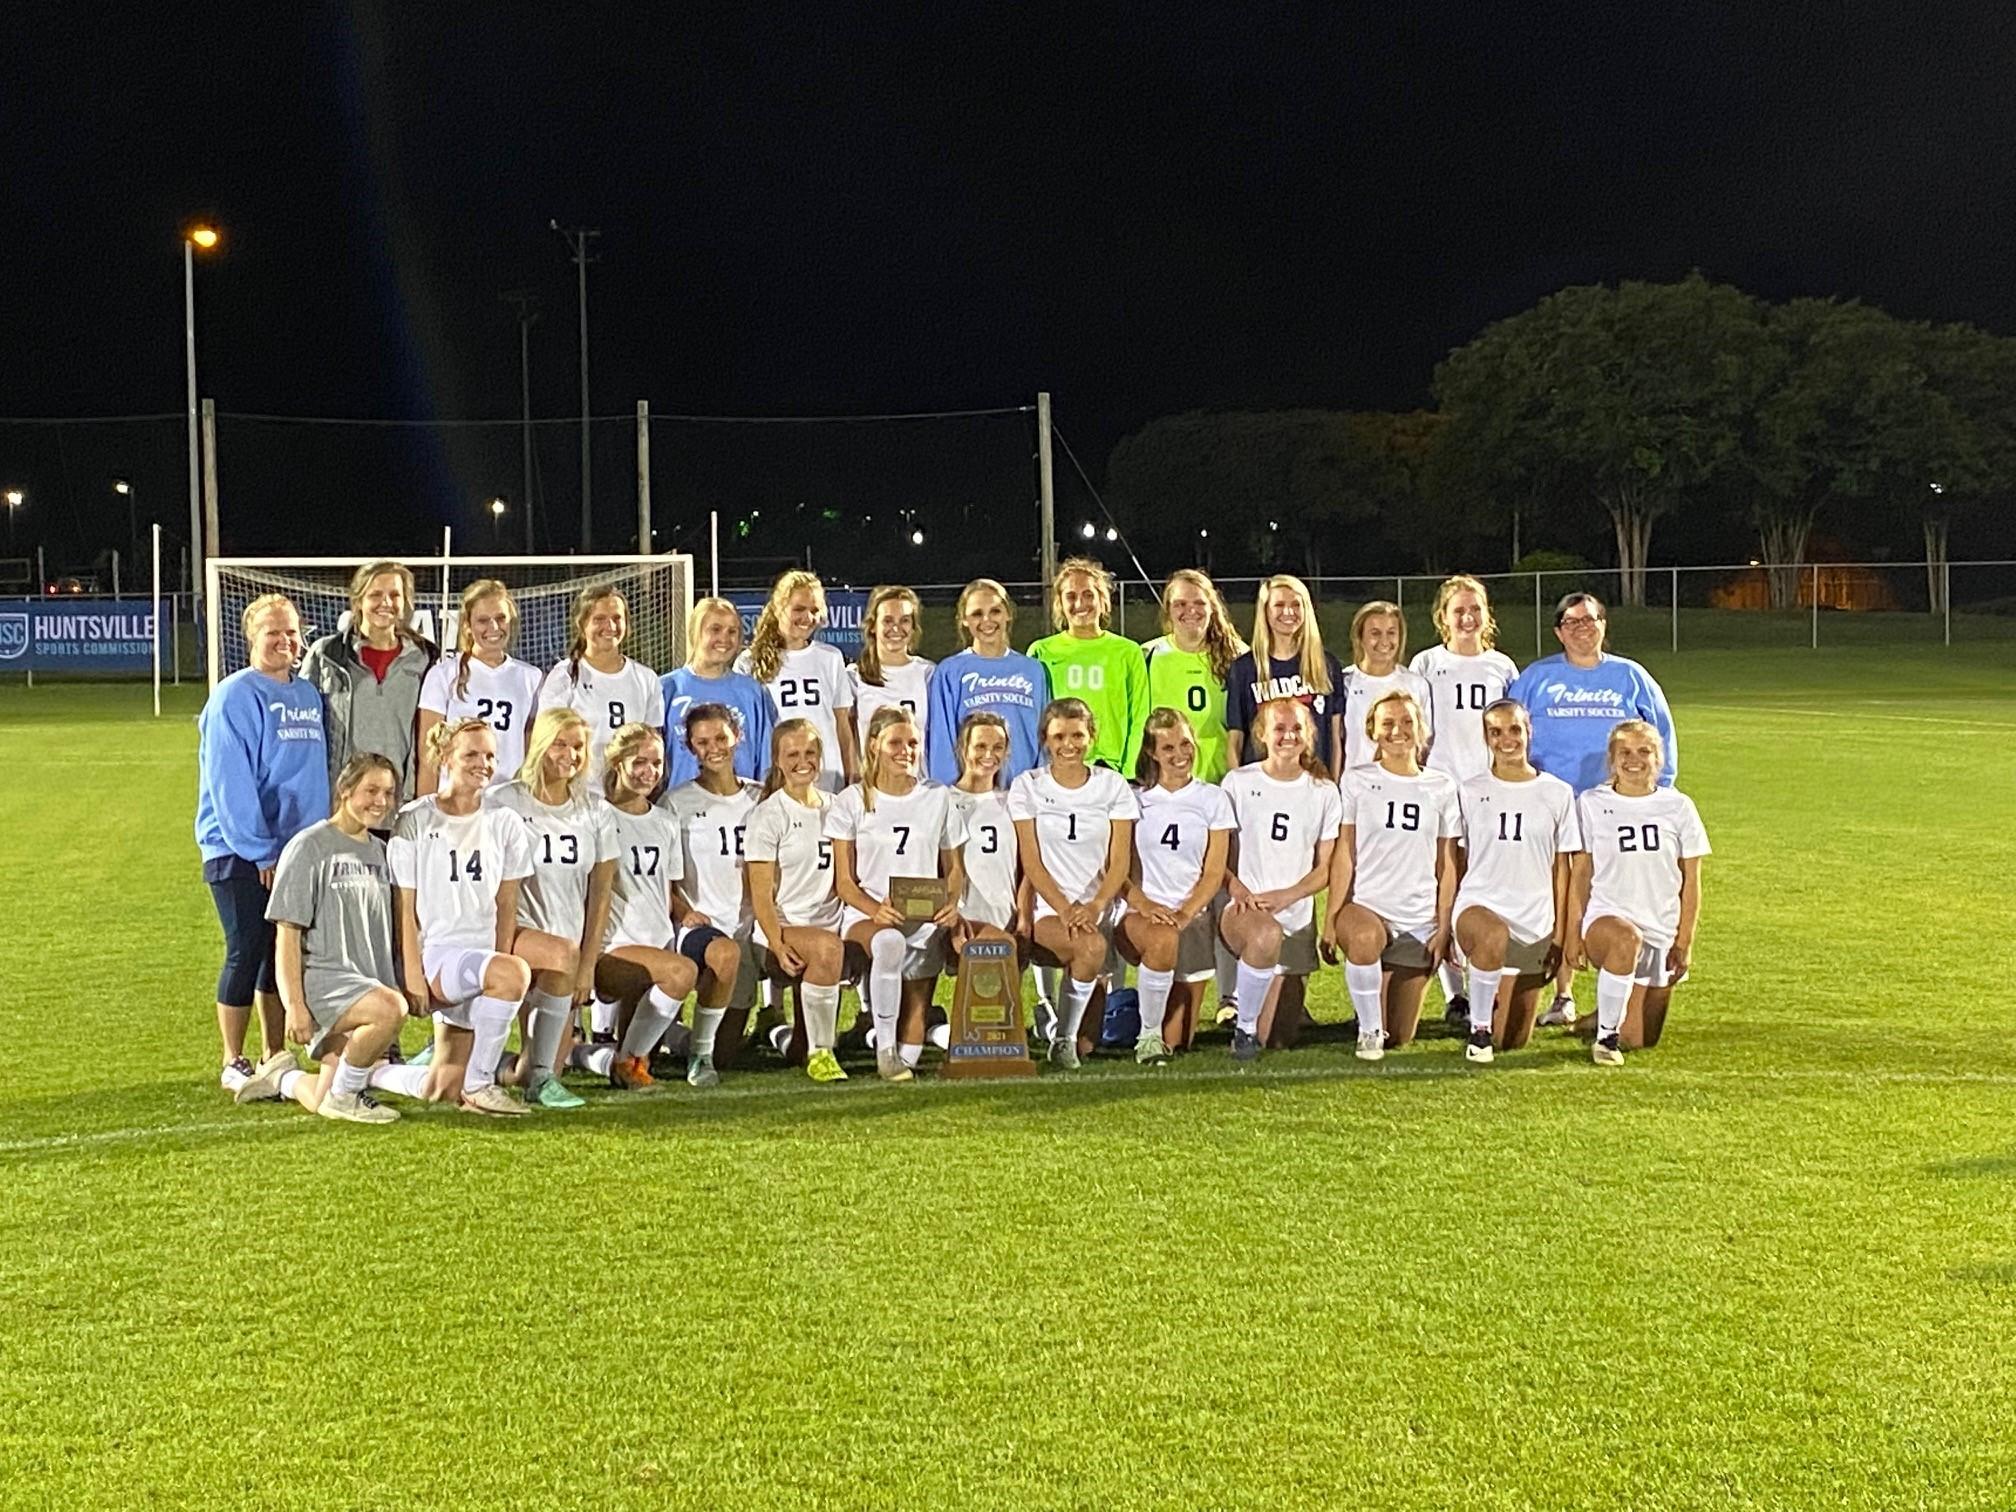 Class 1A-3A Girls' State Soccer Championship